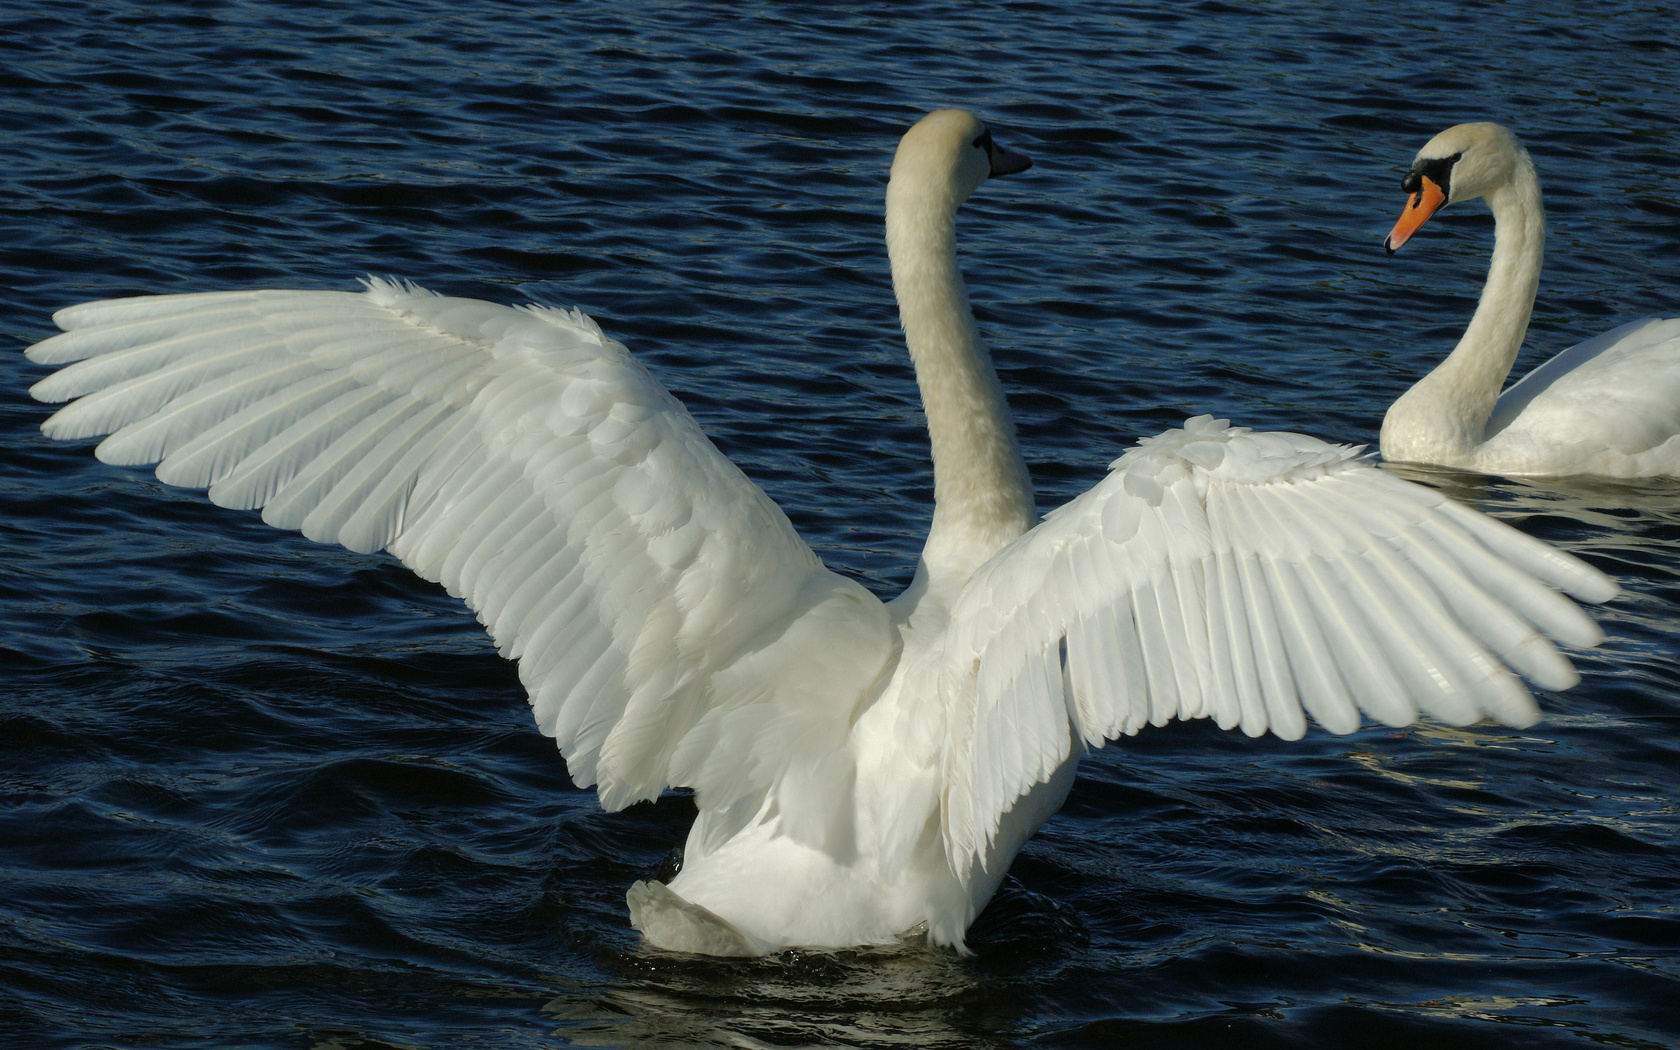 птицы, крылья, лебеди, Пруд, перья, пара, белые, вода